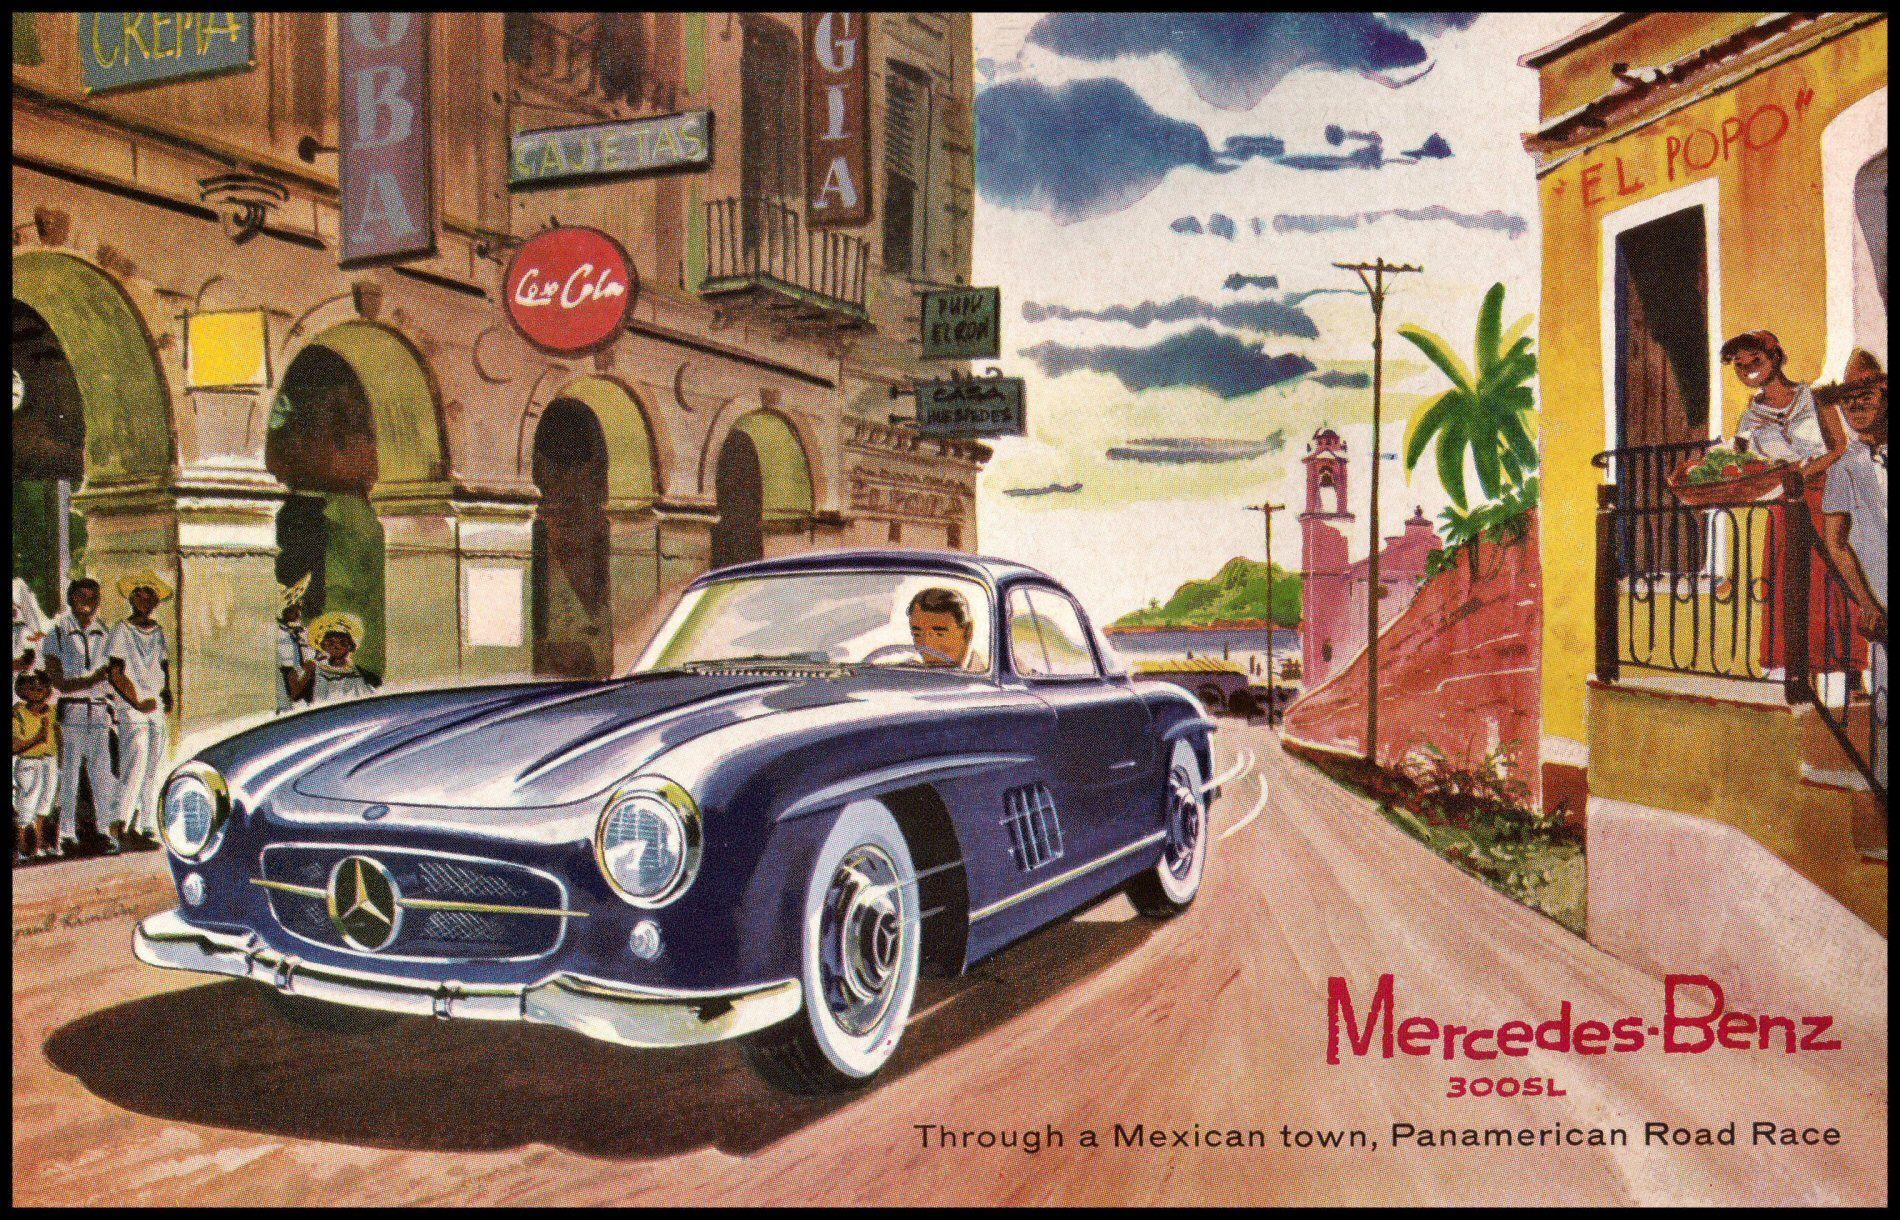 Best Mercedes Benz Posters Images On Pinterest Mercedes